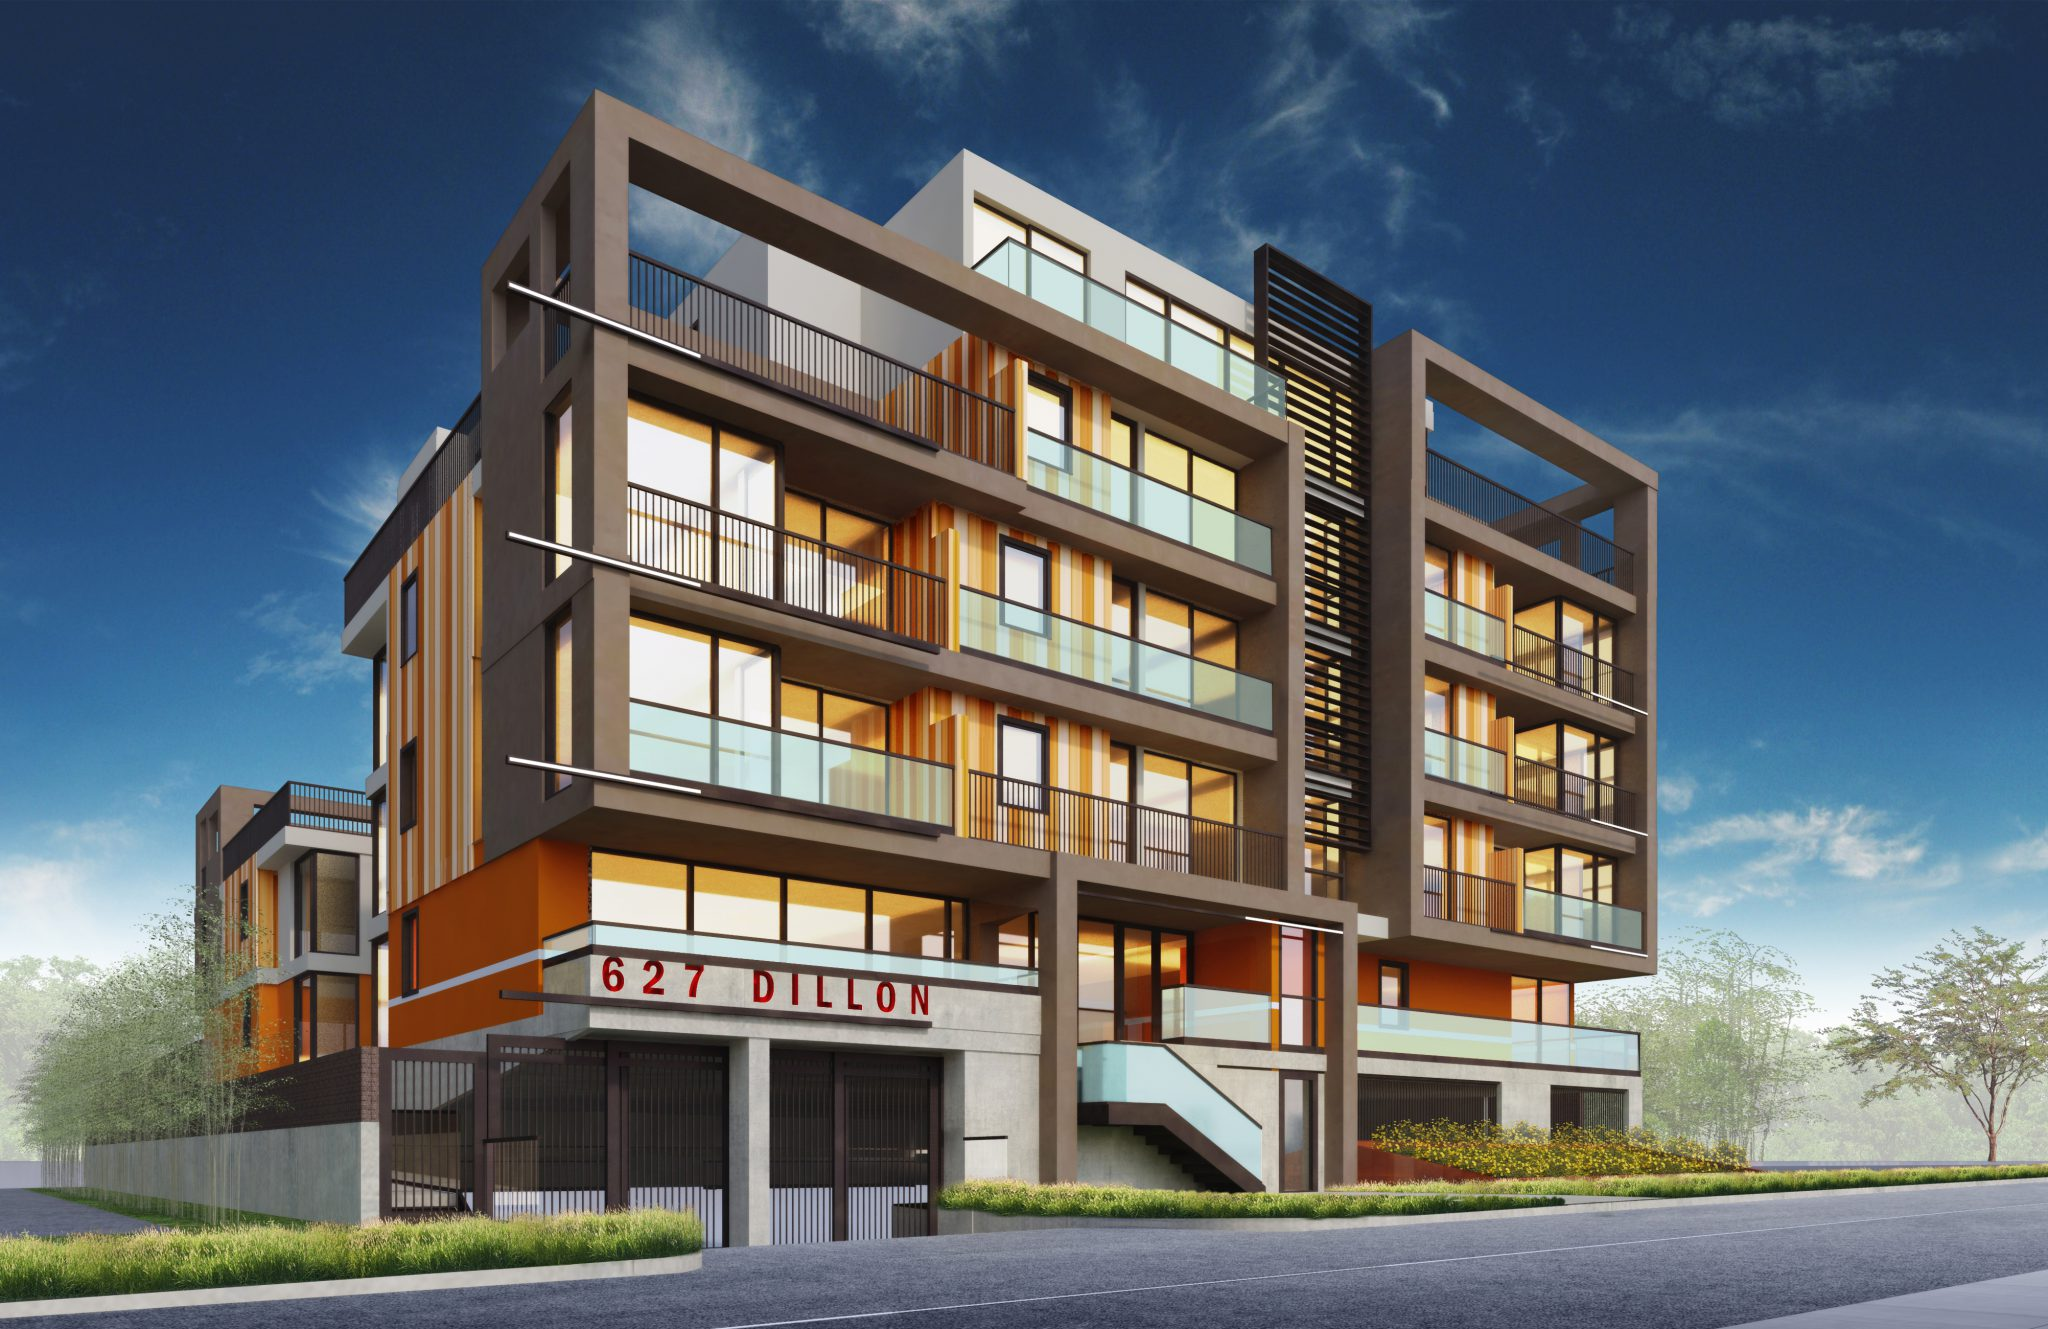 627 Dillon Apartments